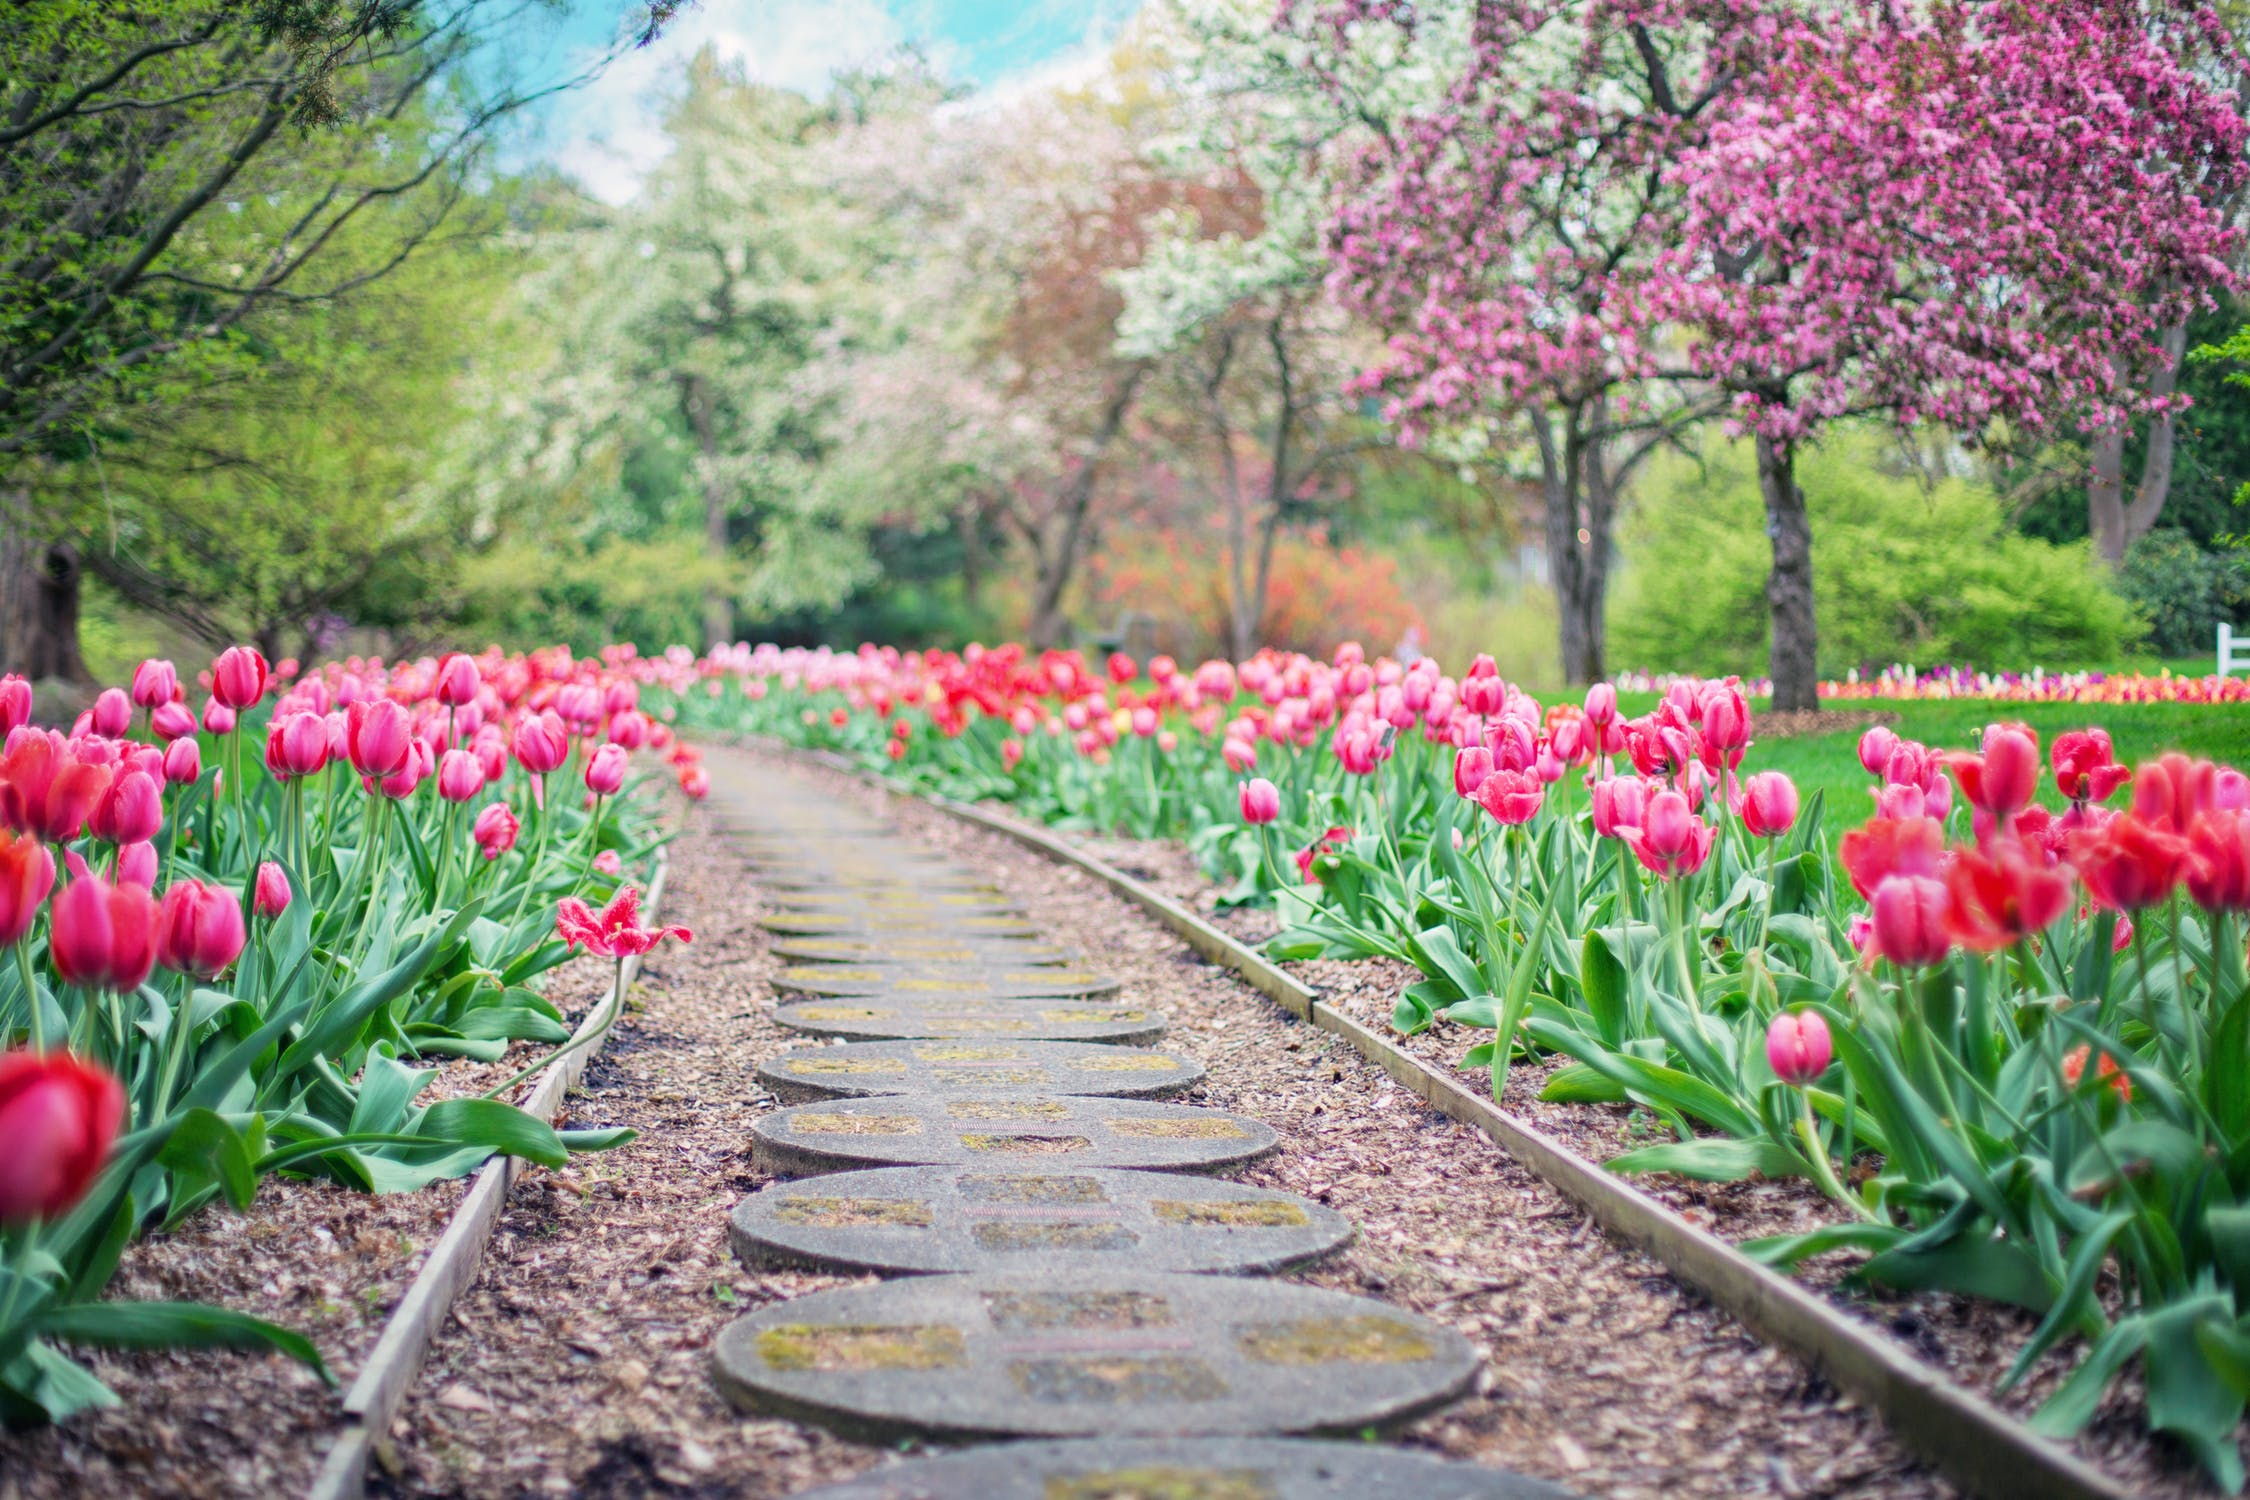 Je tuin lente klaar maken